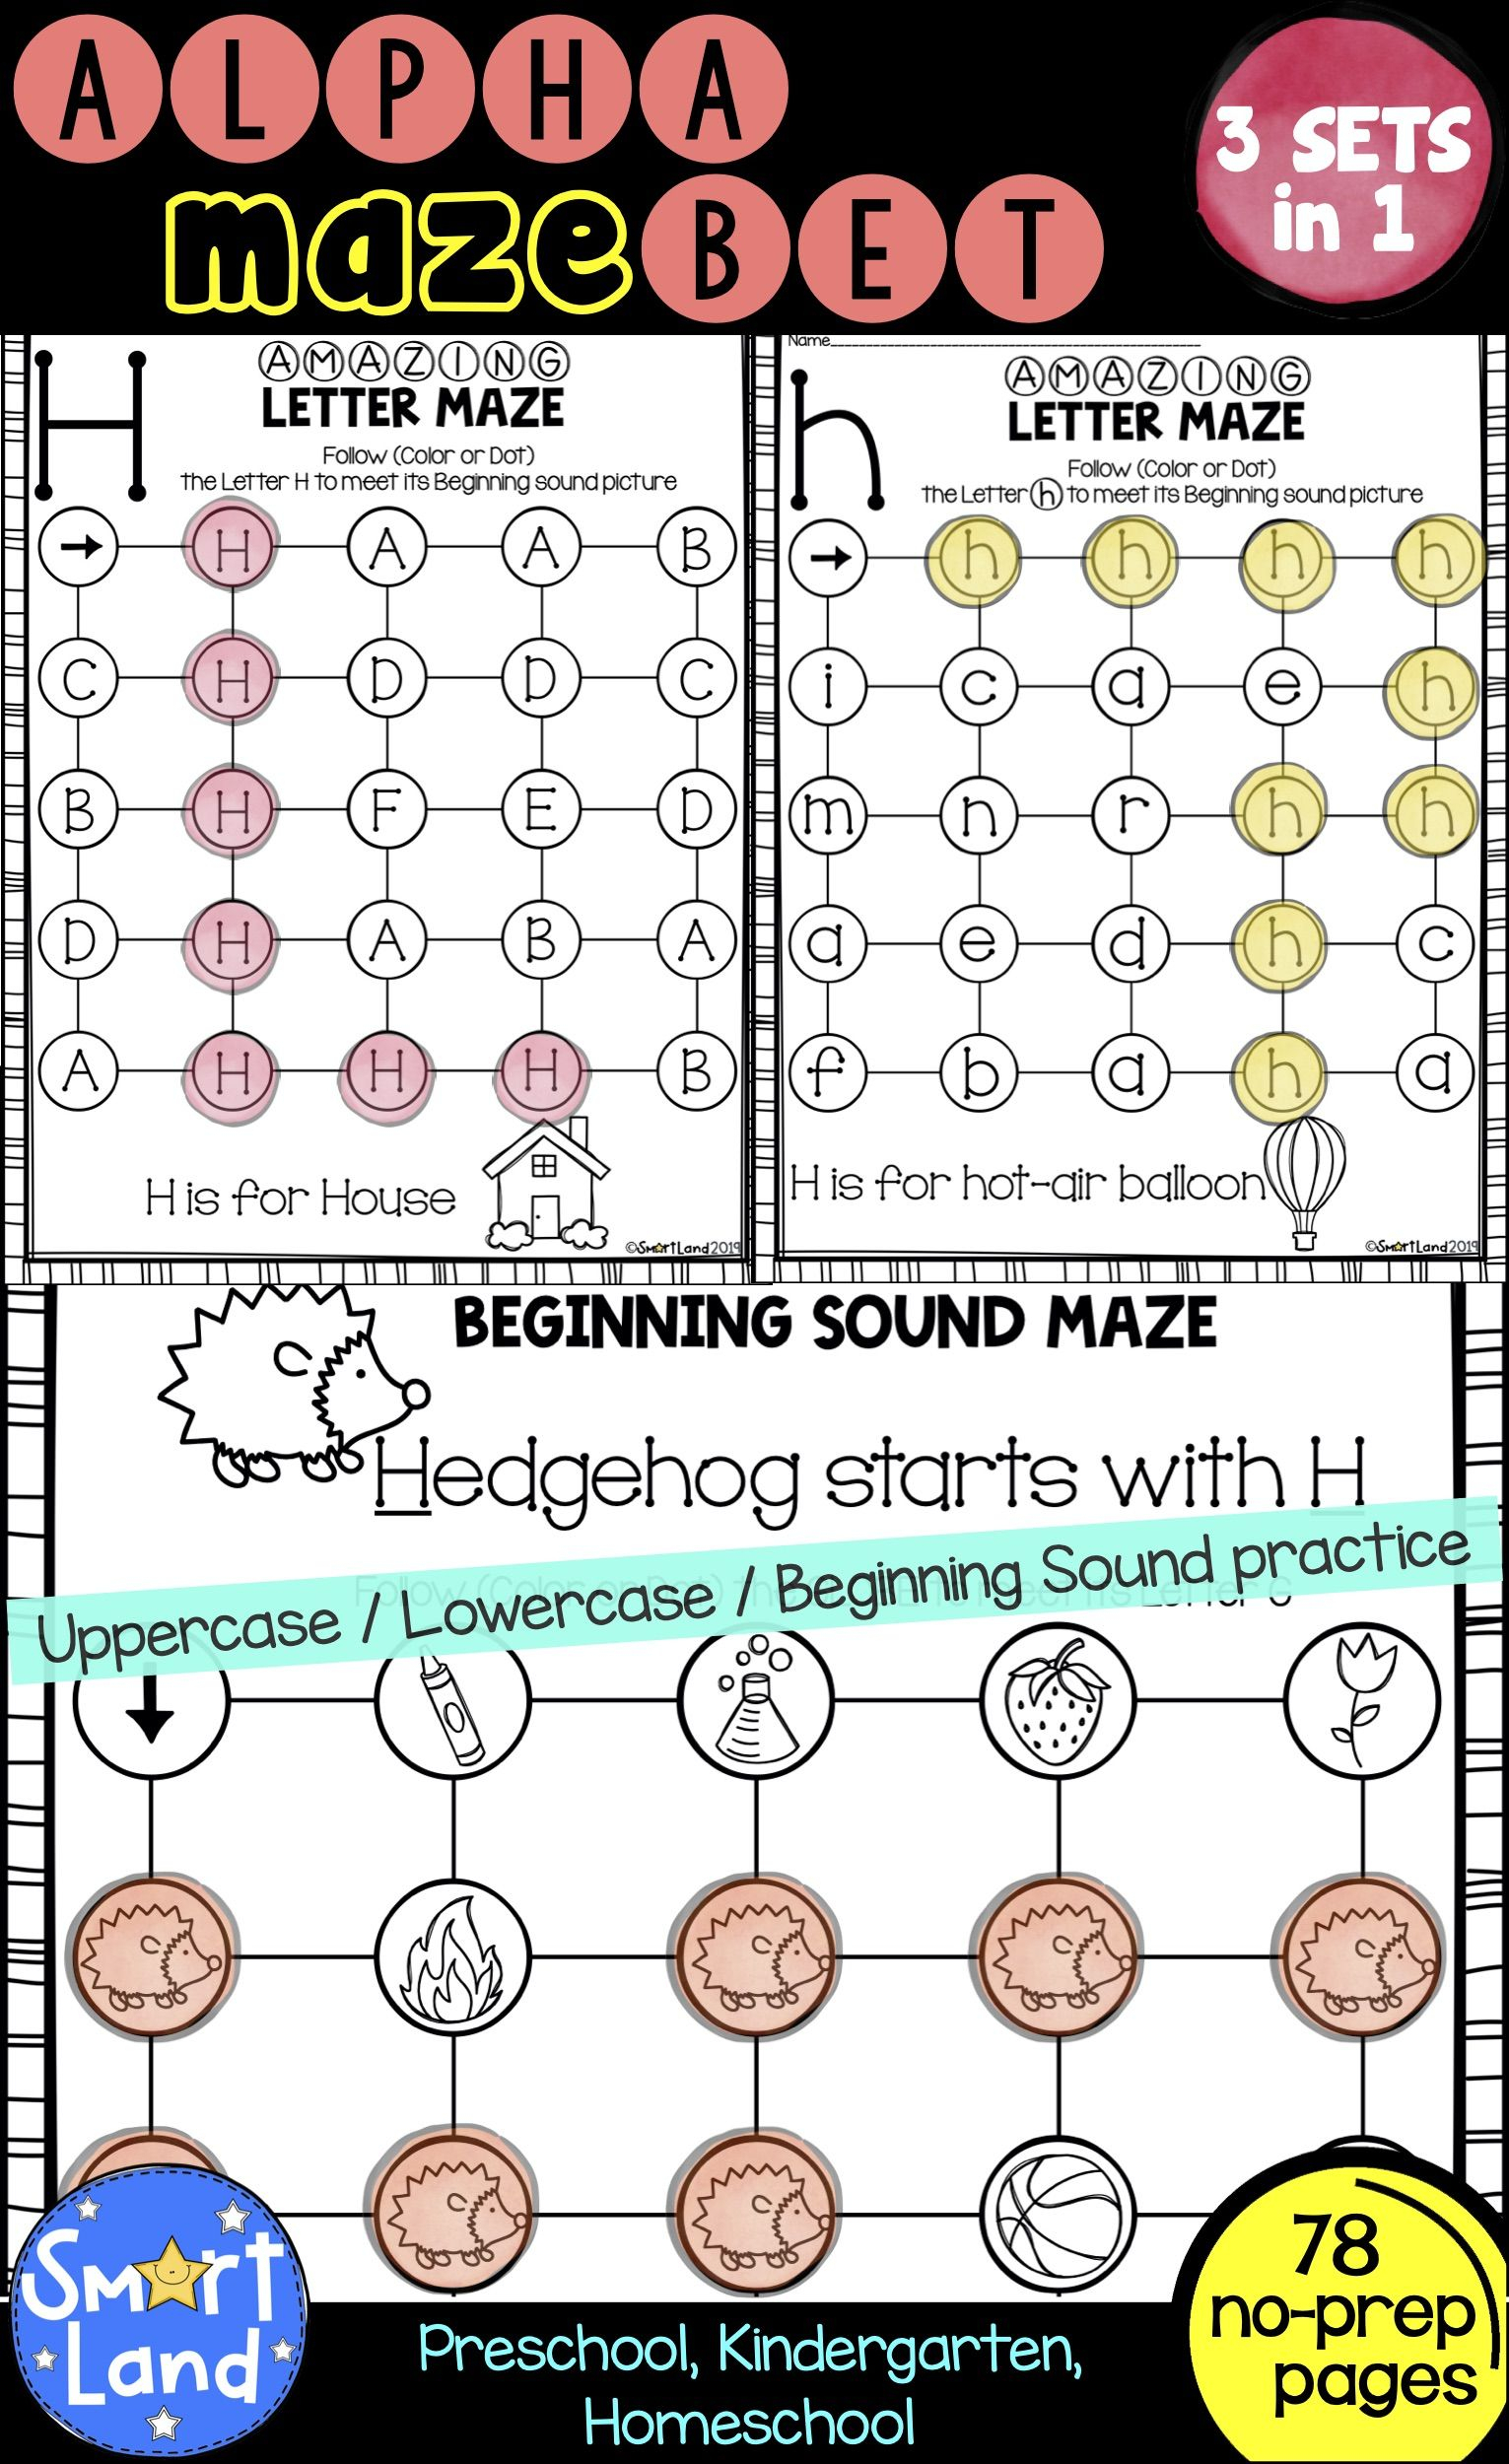 Alphabet Practice_3Sets Of Letter Mazes (With Images inside Alphabet Worksheets Maze